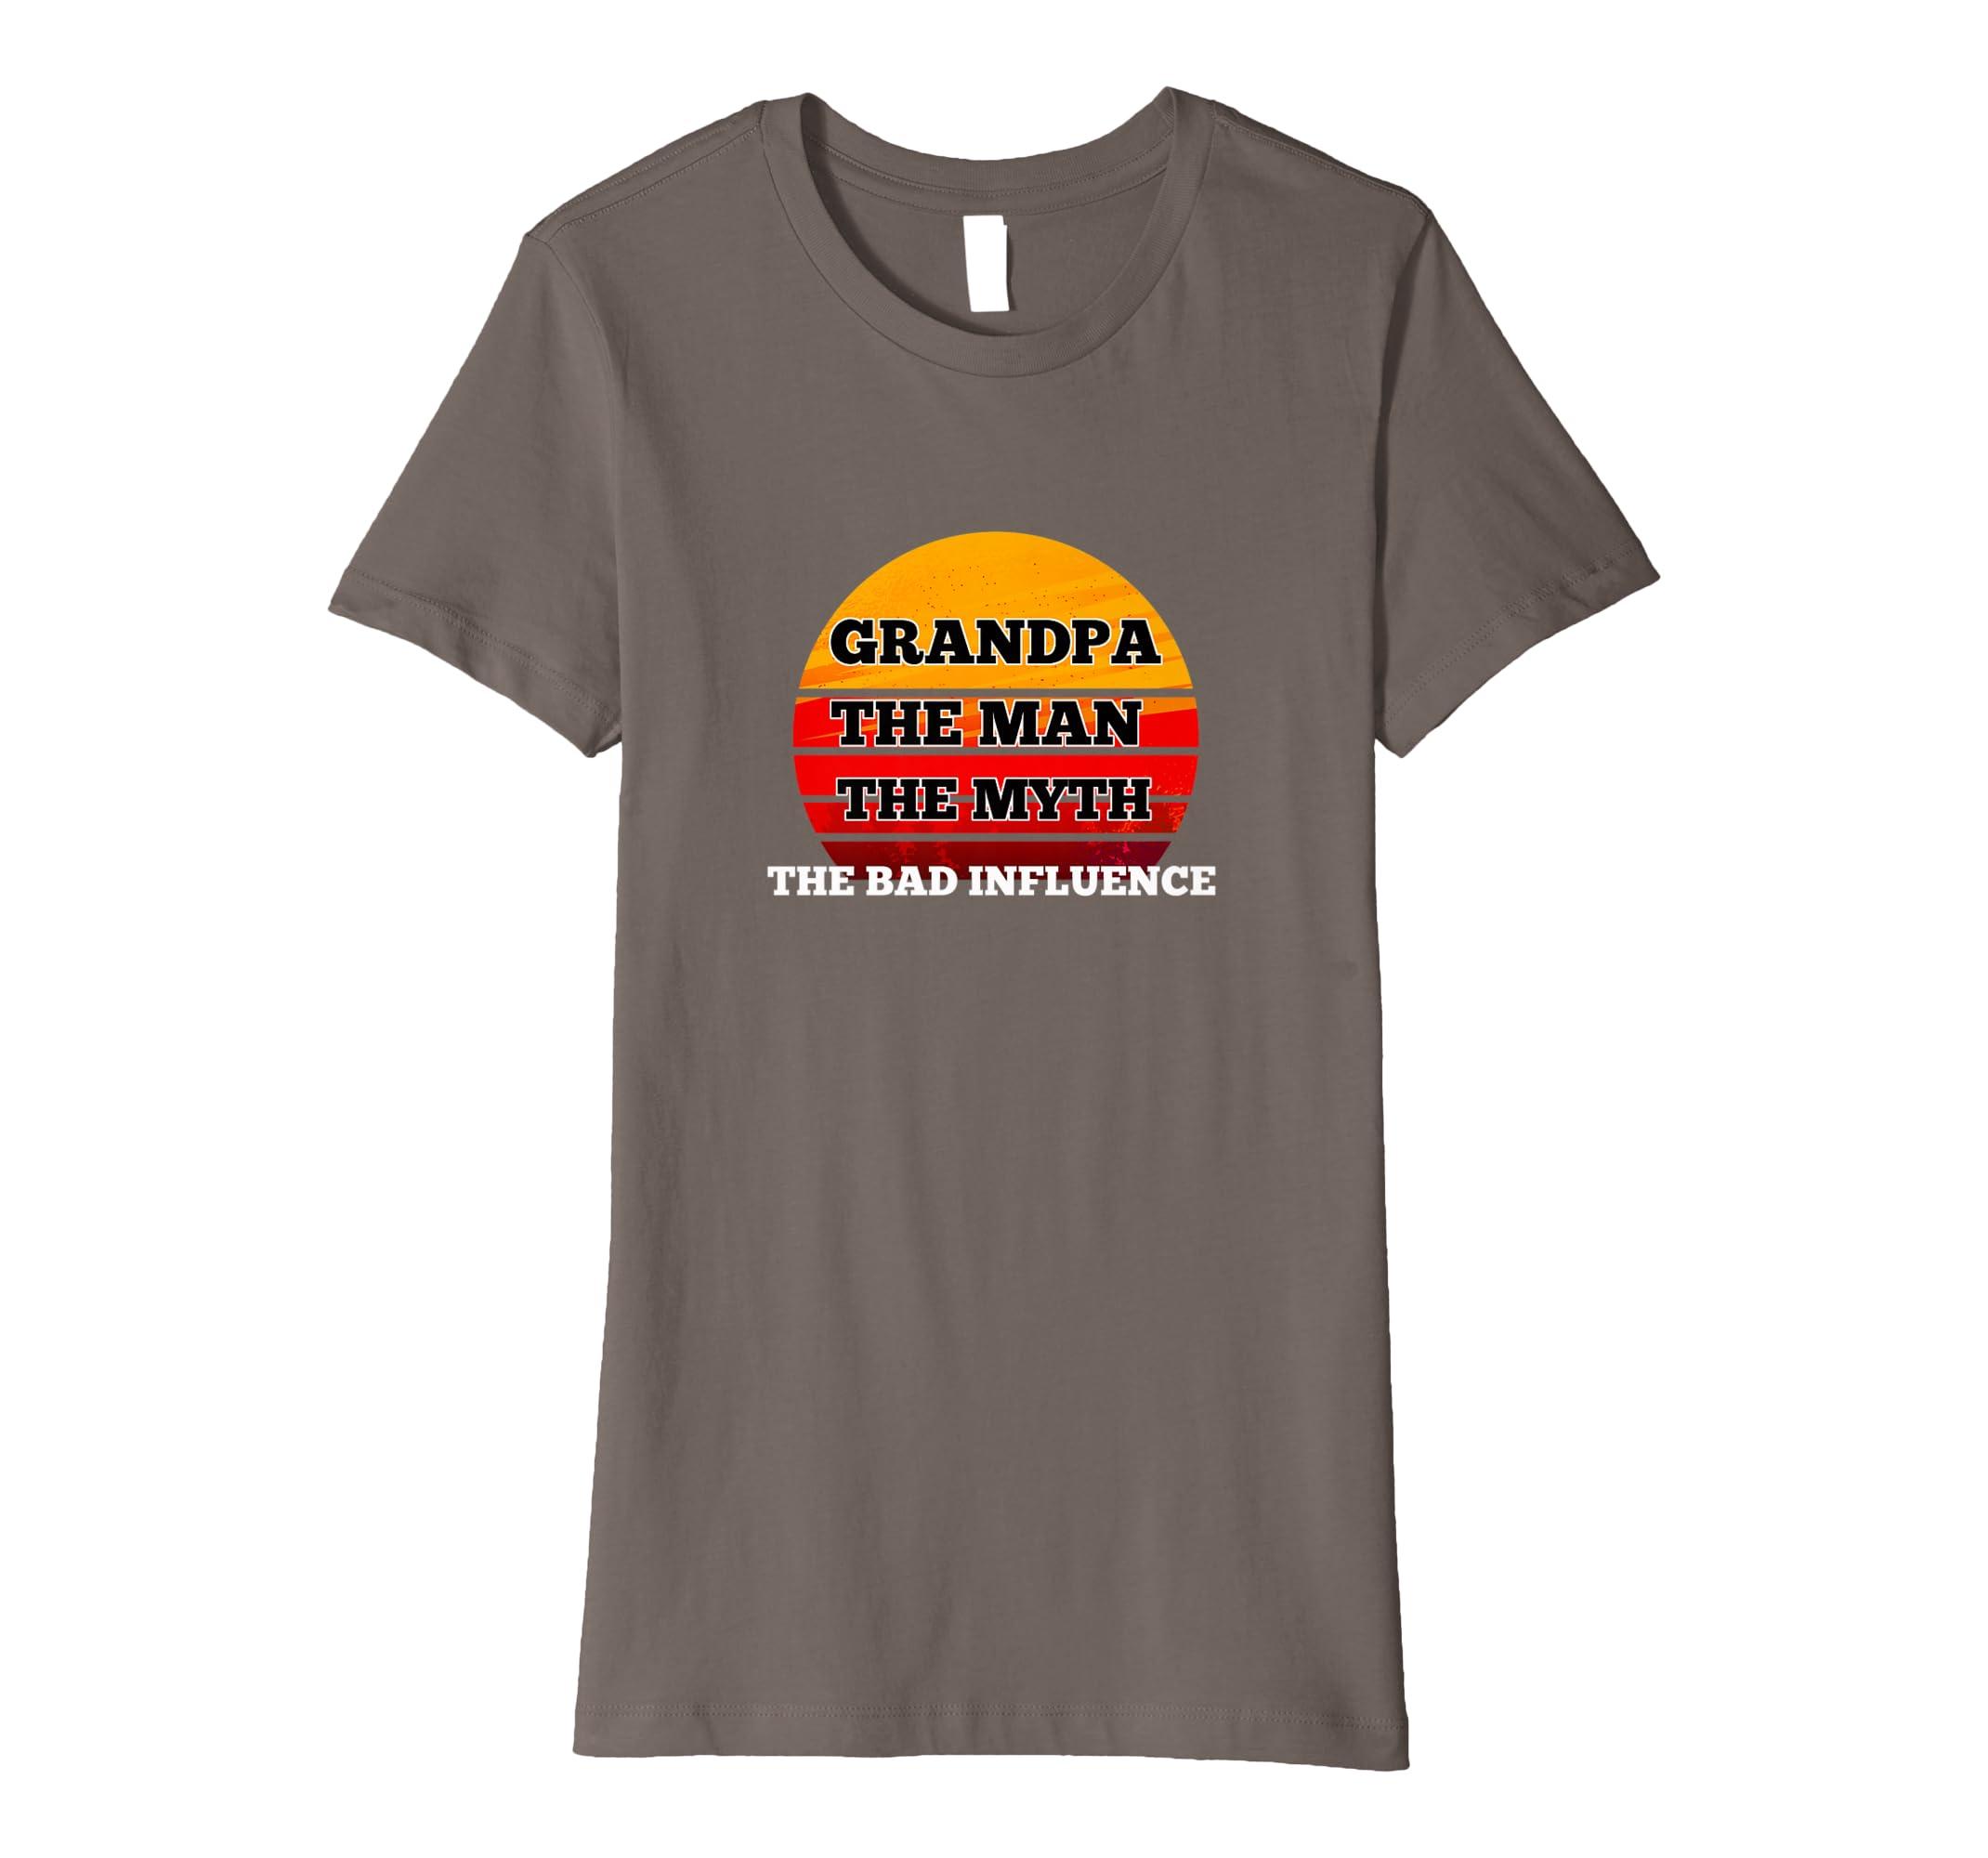 709400bd4 Amazon.com: Grandpa The Man The Myth The Bad Influence Gift T-shirt:  Clothing